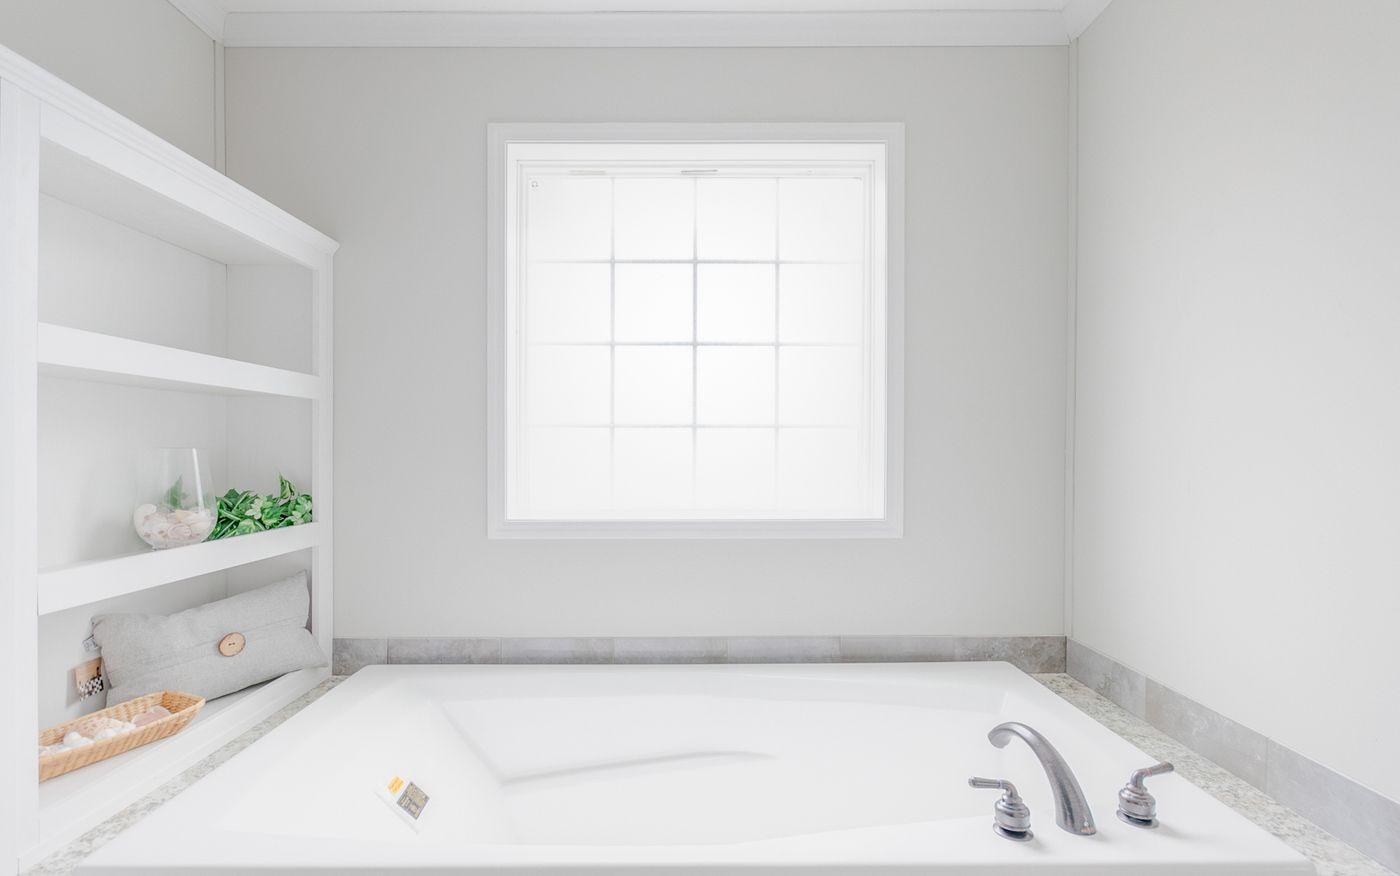 The Harding Bathroom